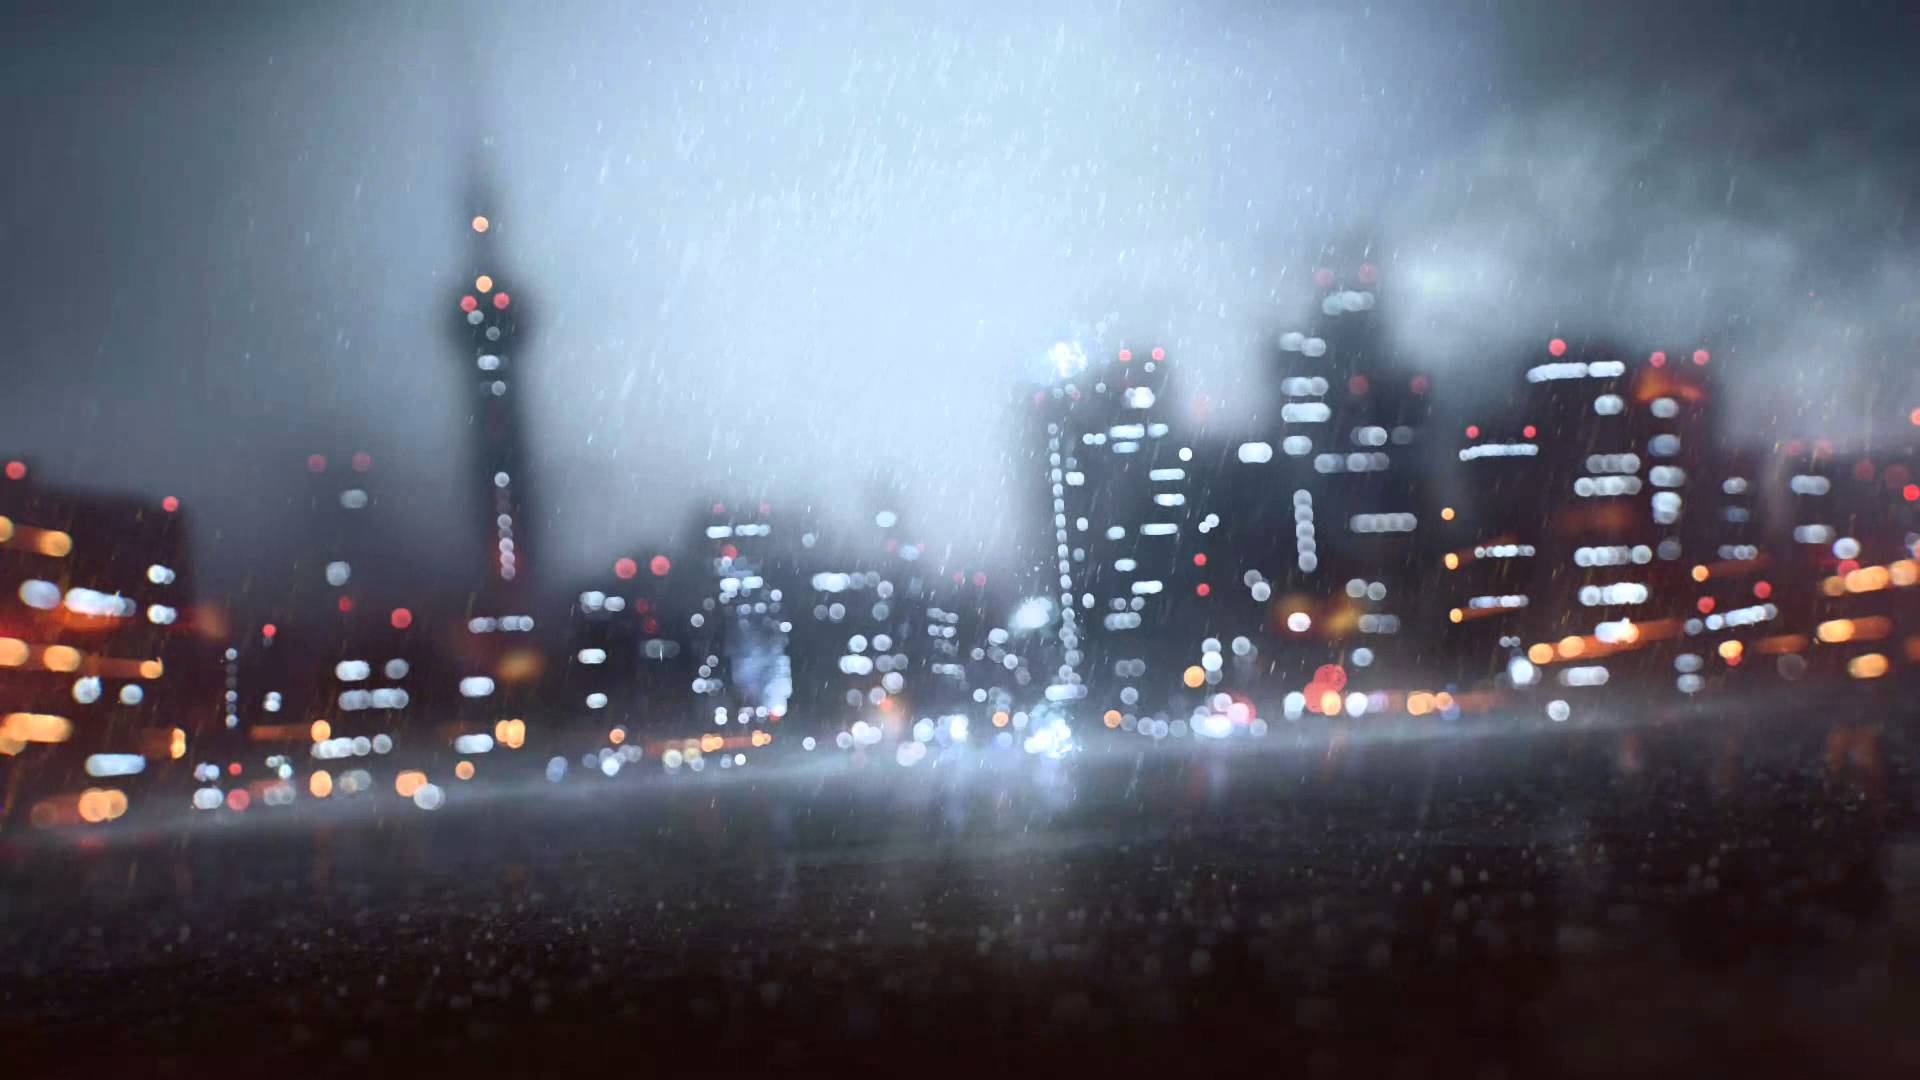 Battlefield 4 Rain Background [HD] [Free Download] Animated - YouTube